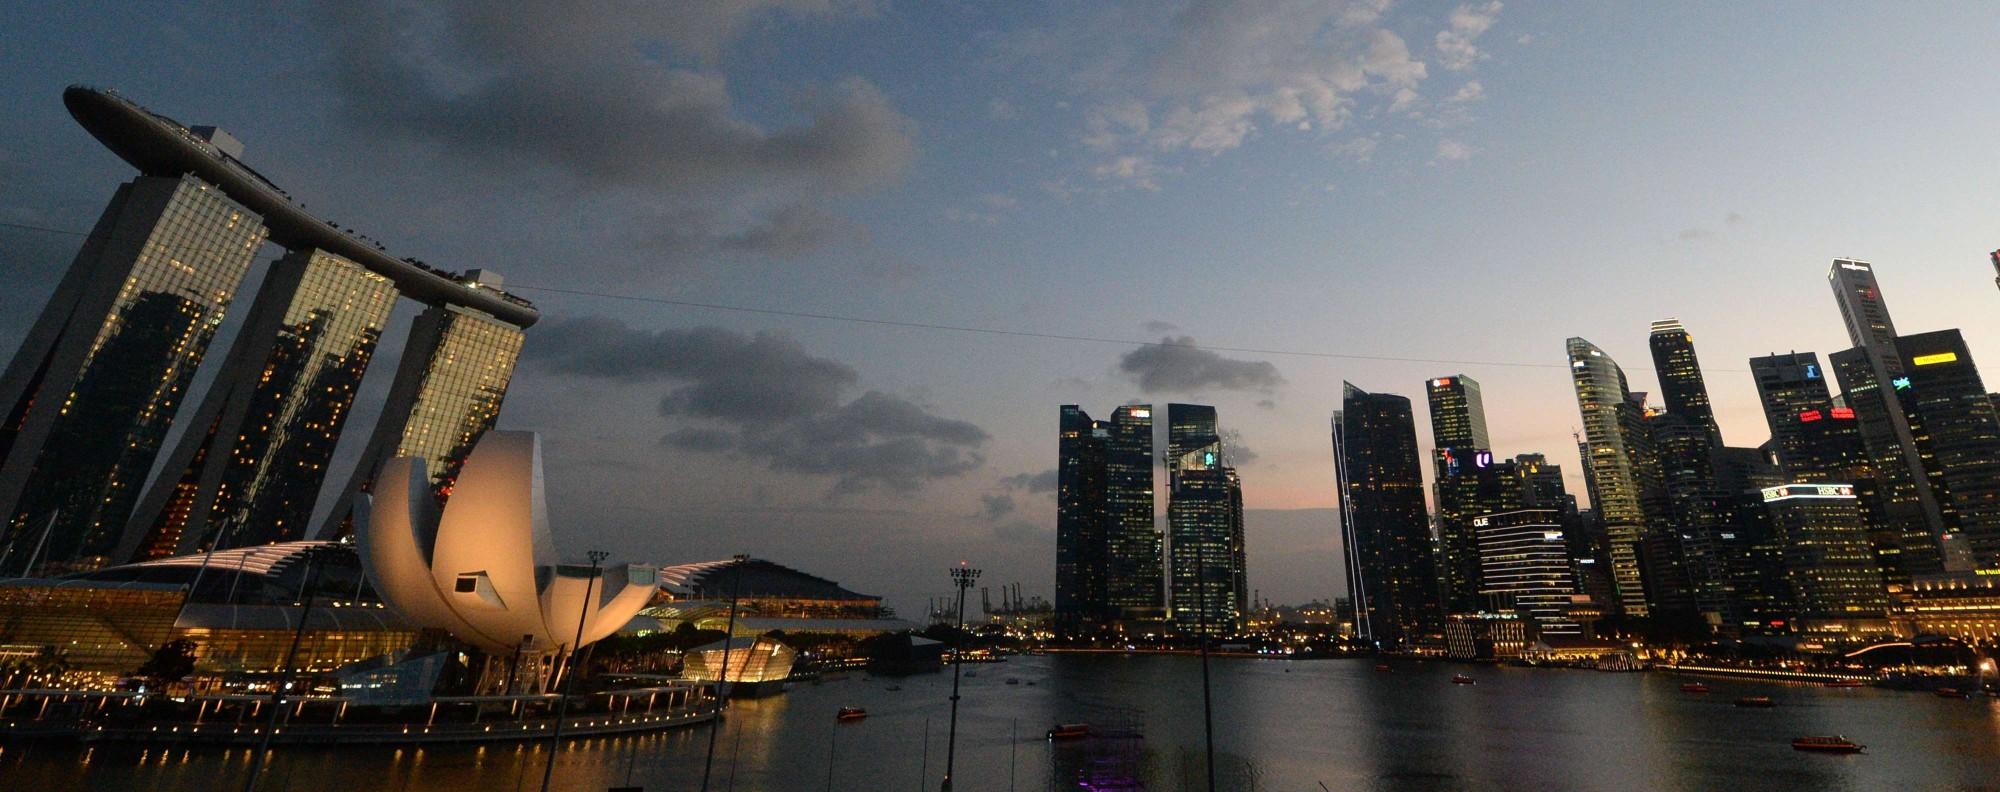 Singapore | South China Morning Post